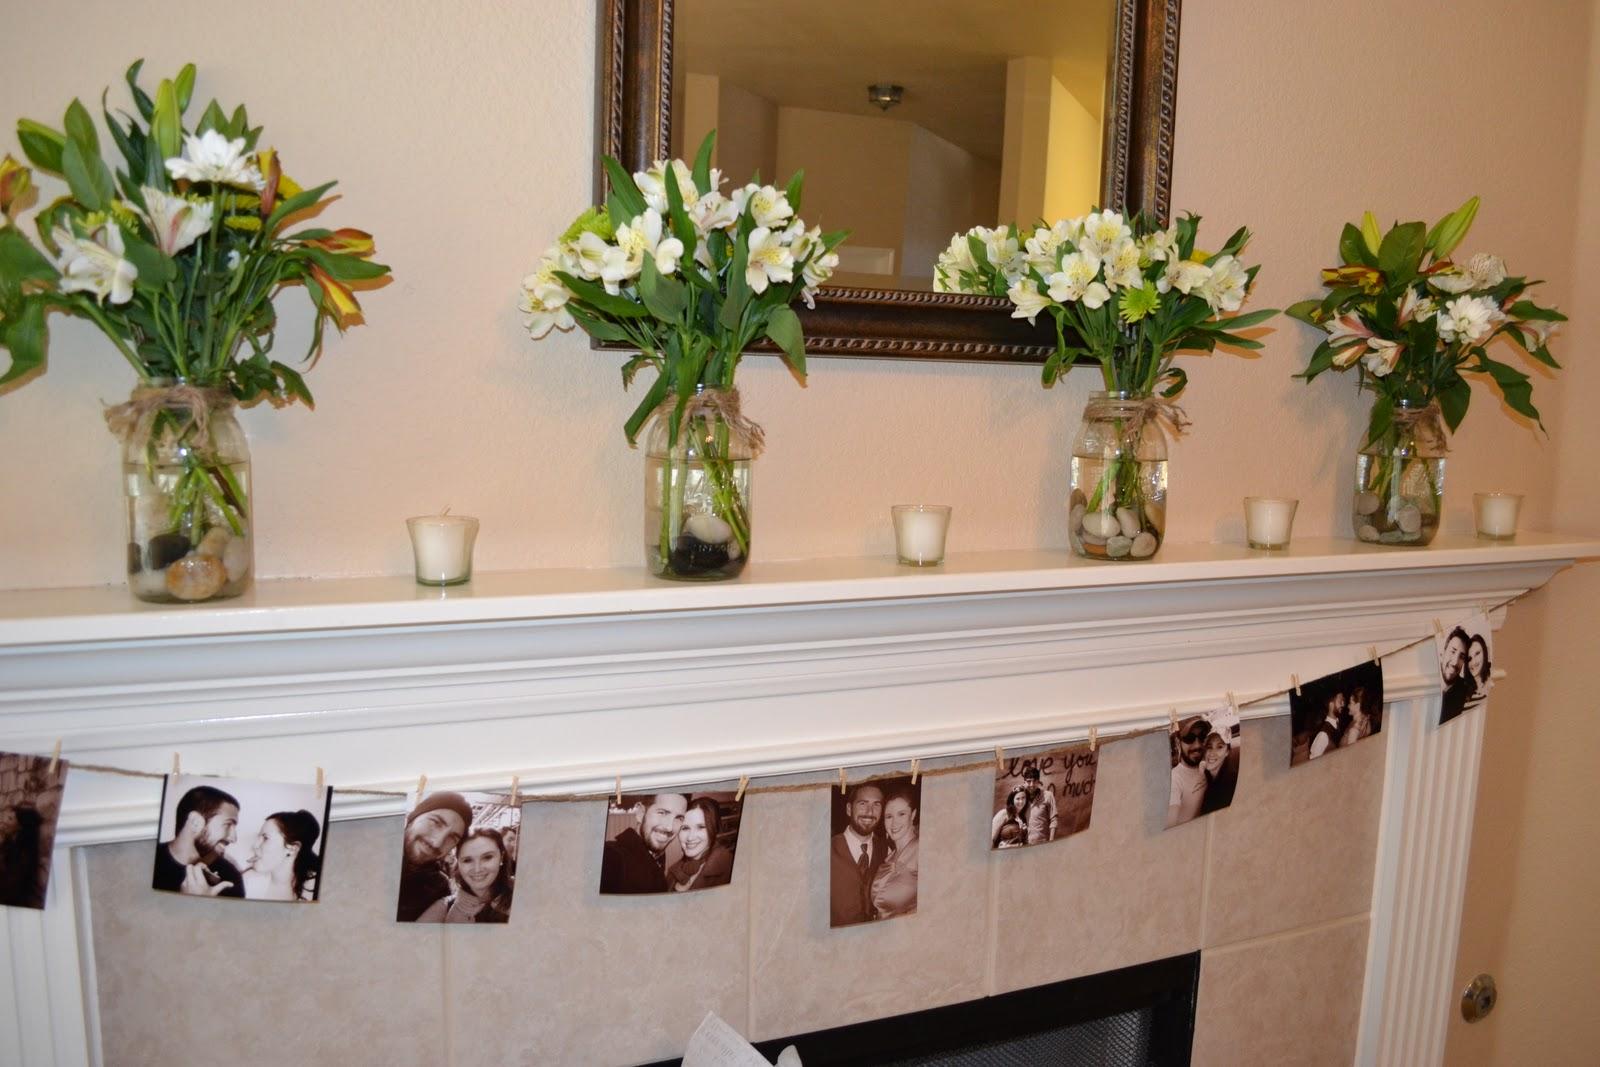 bridal shower table decorations ideaspinterest photograph. Black Bedroom Furniture Sets. Home Design Ideas